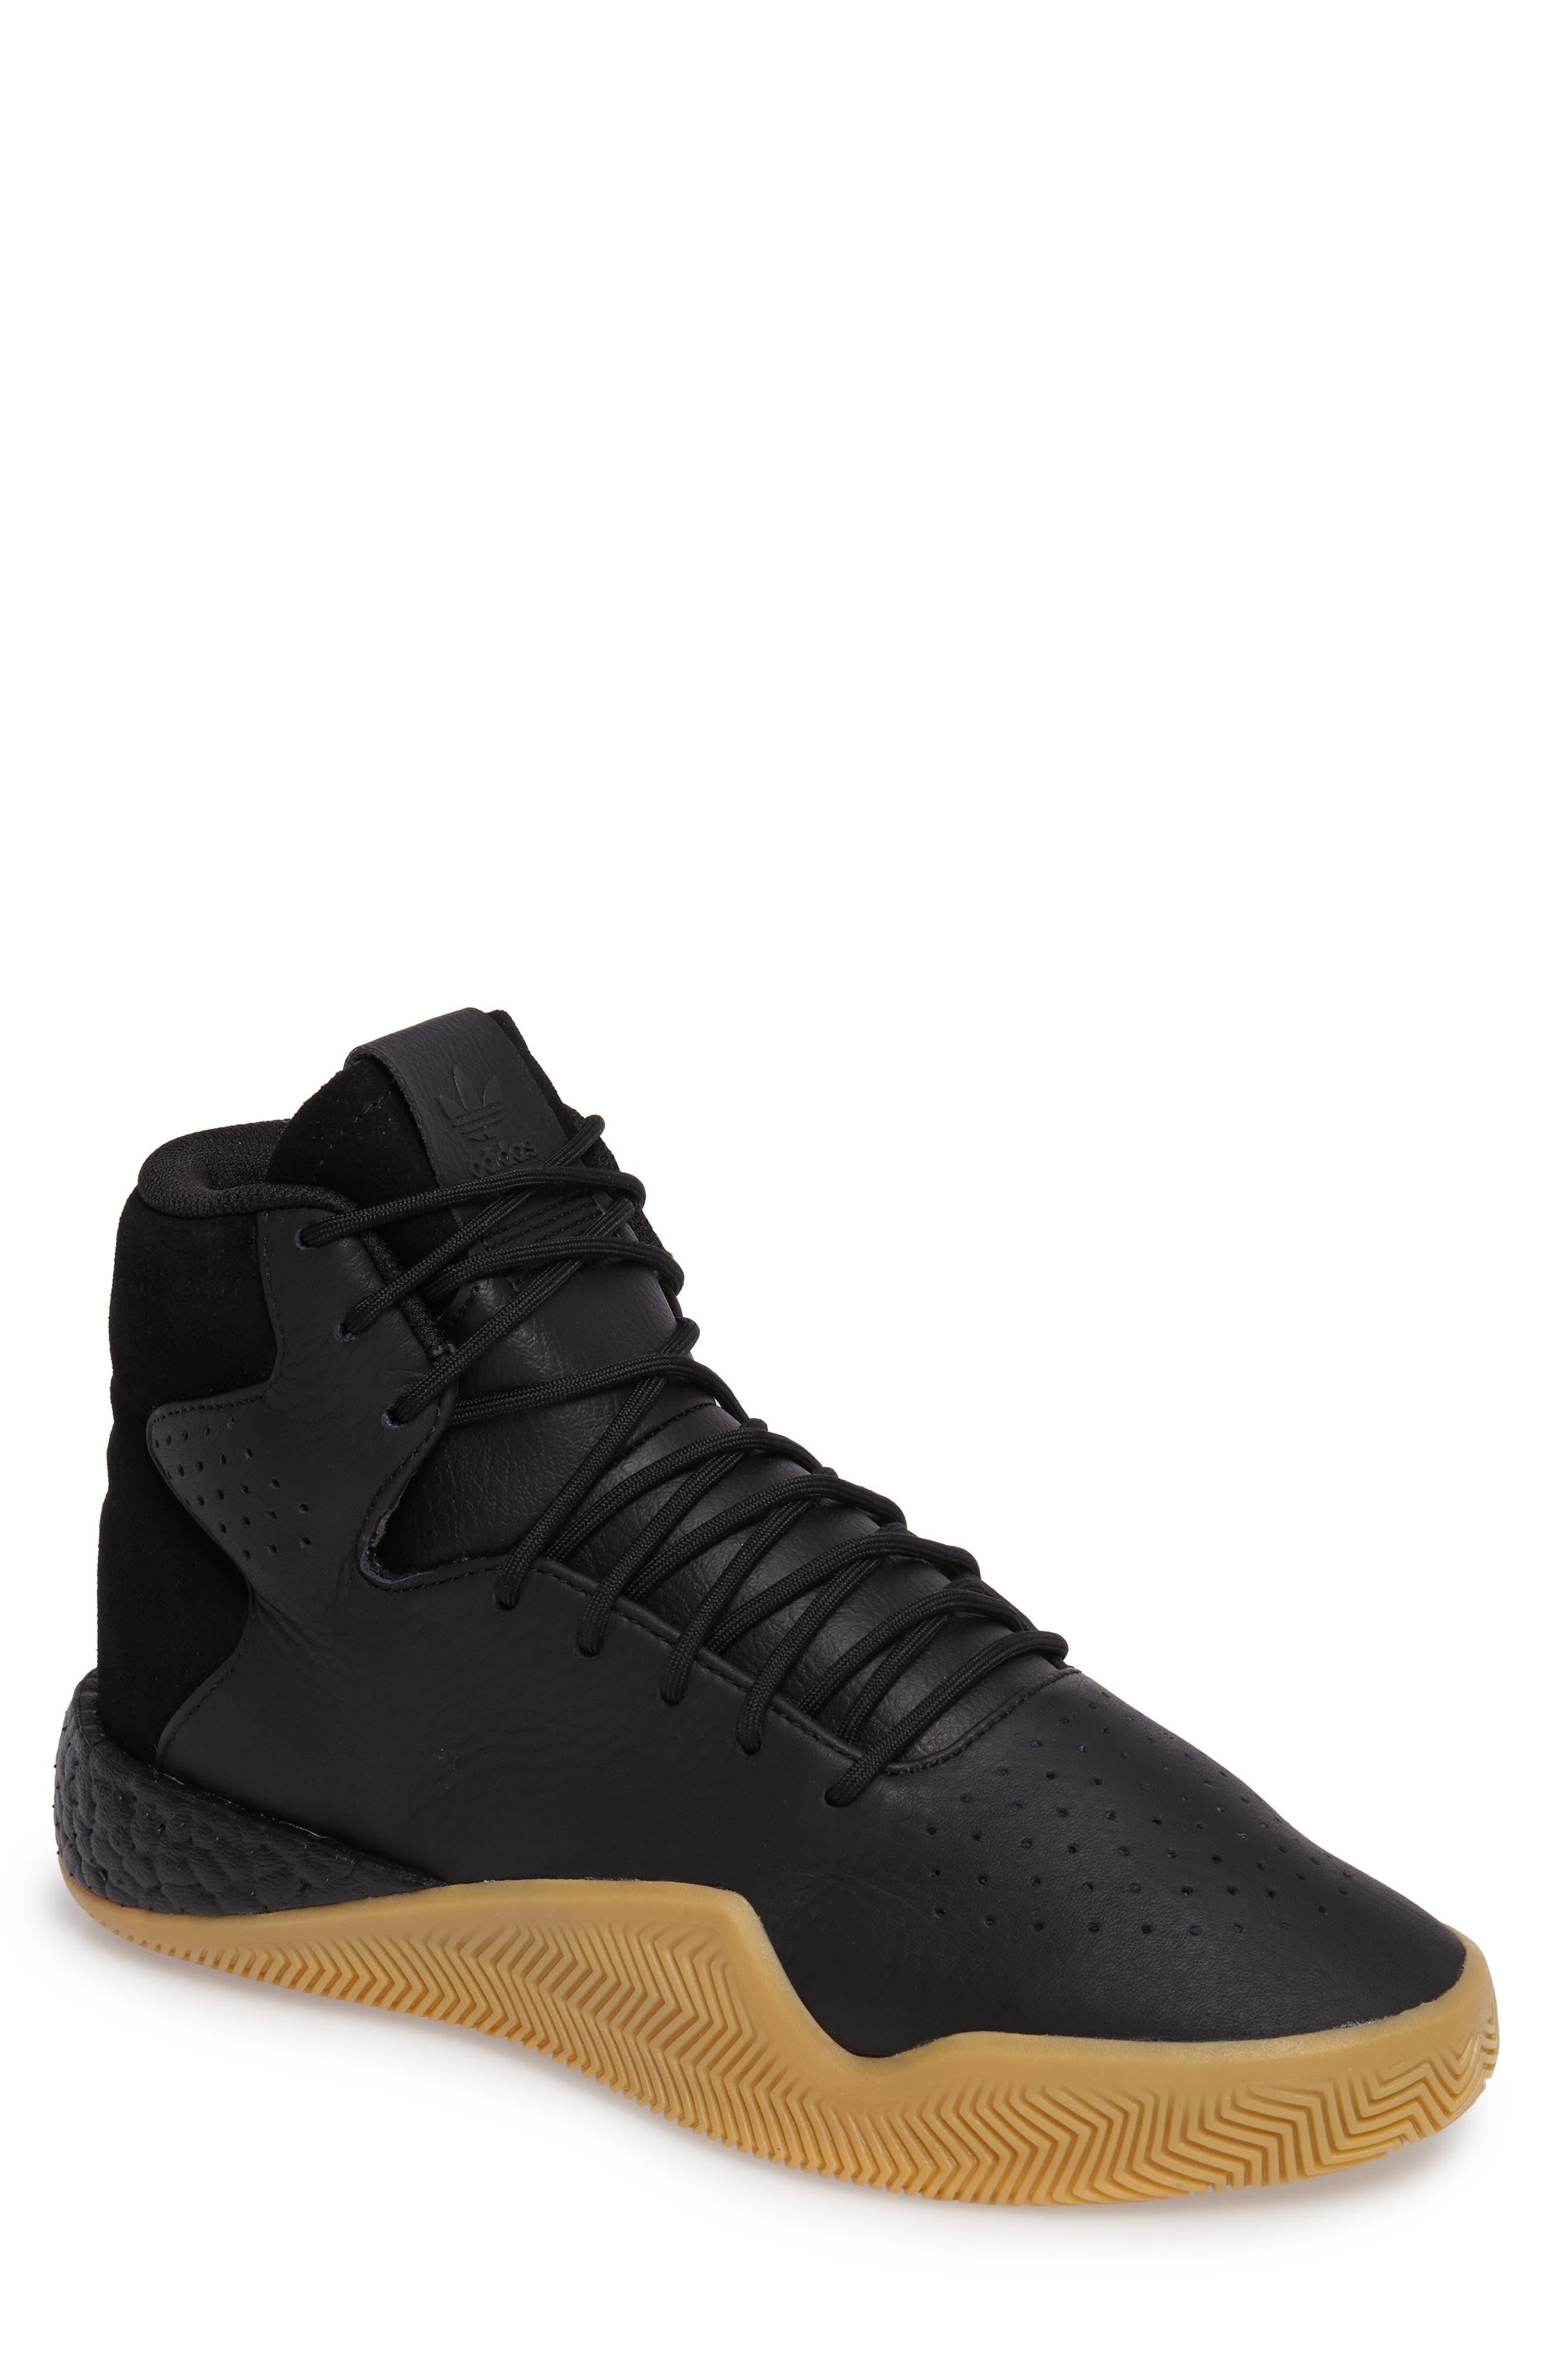 adidas Tubular Instinct Boost Sneaker (Men)